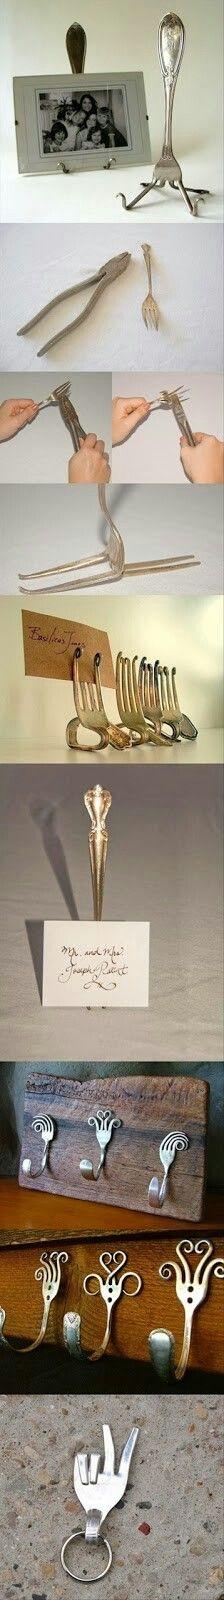 http://4.bp.blogspot.com/-HRqlZp12xOM/Ut5QaVLO2UI/AAAAAAAAAlA/ktn1J-ajh6Y/s1600/forks-for-hangers.jpg